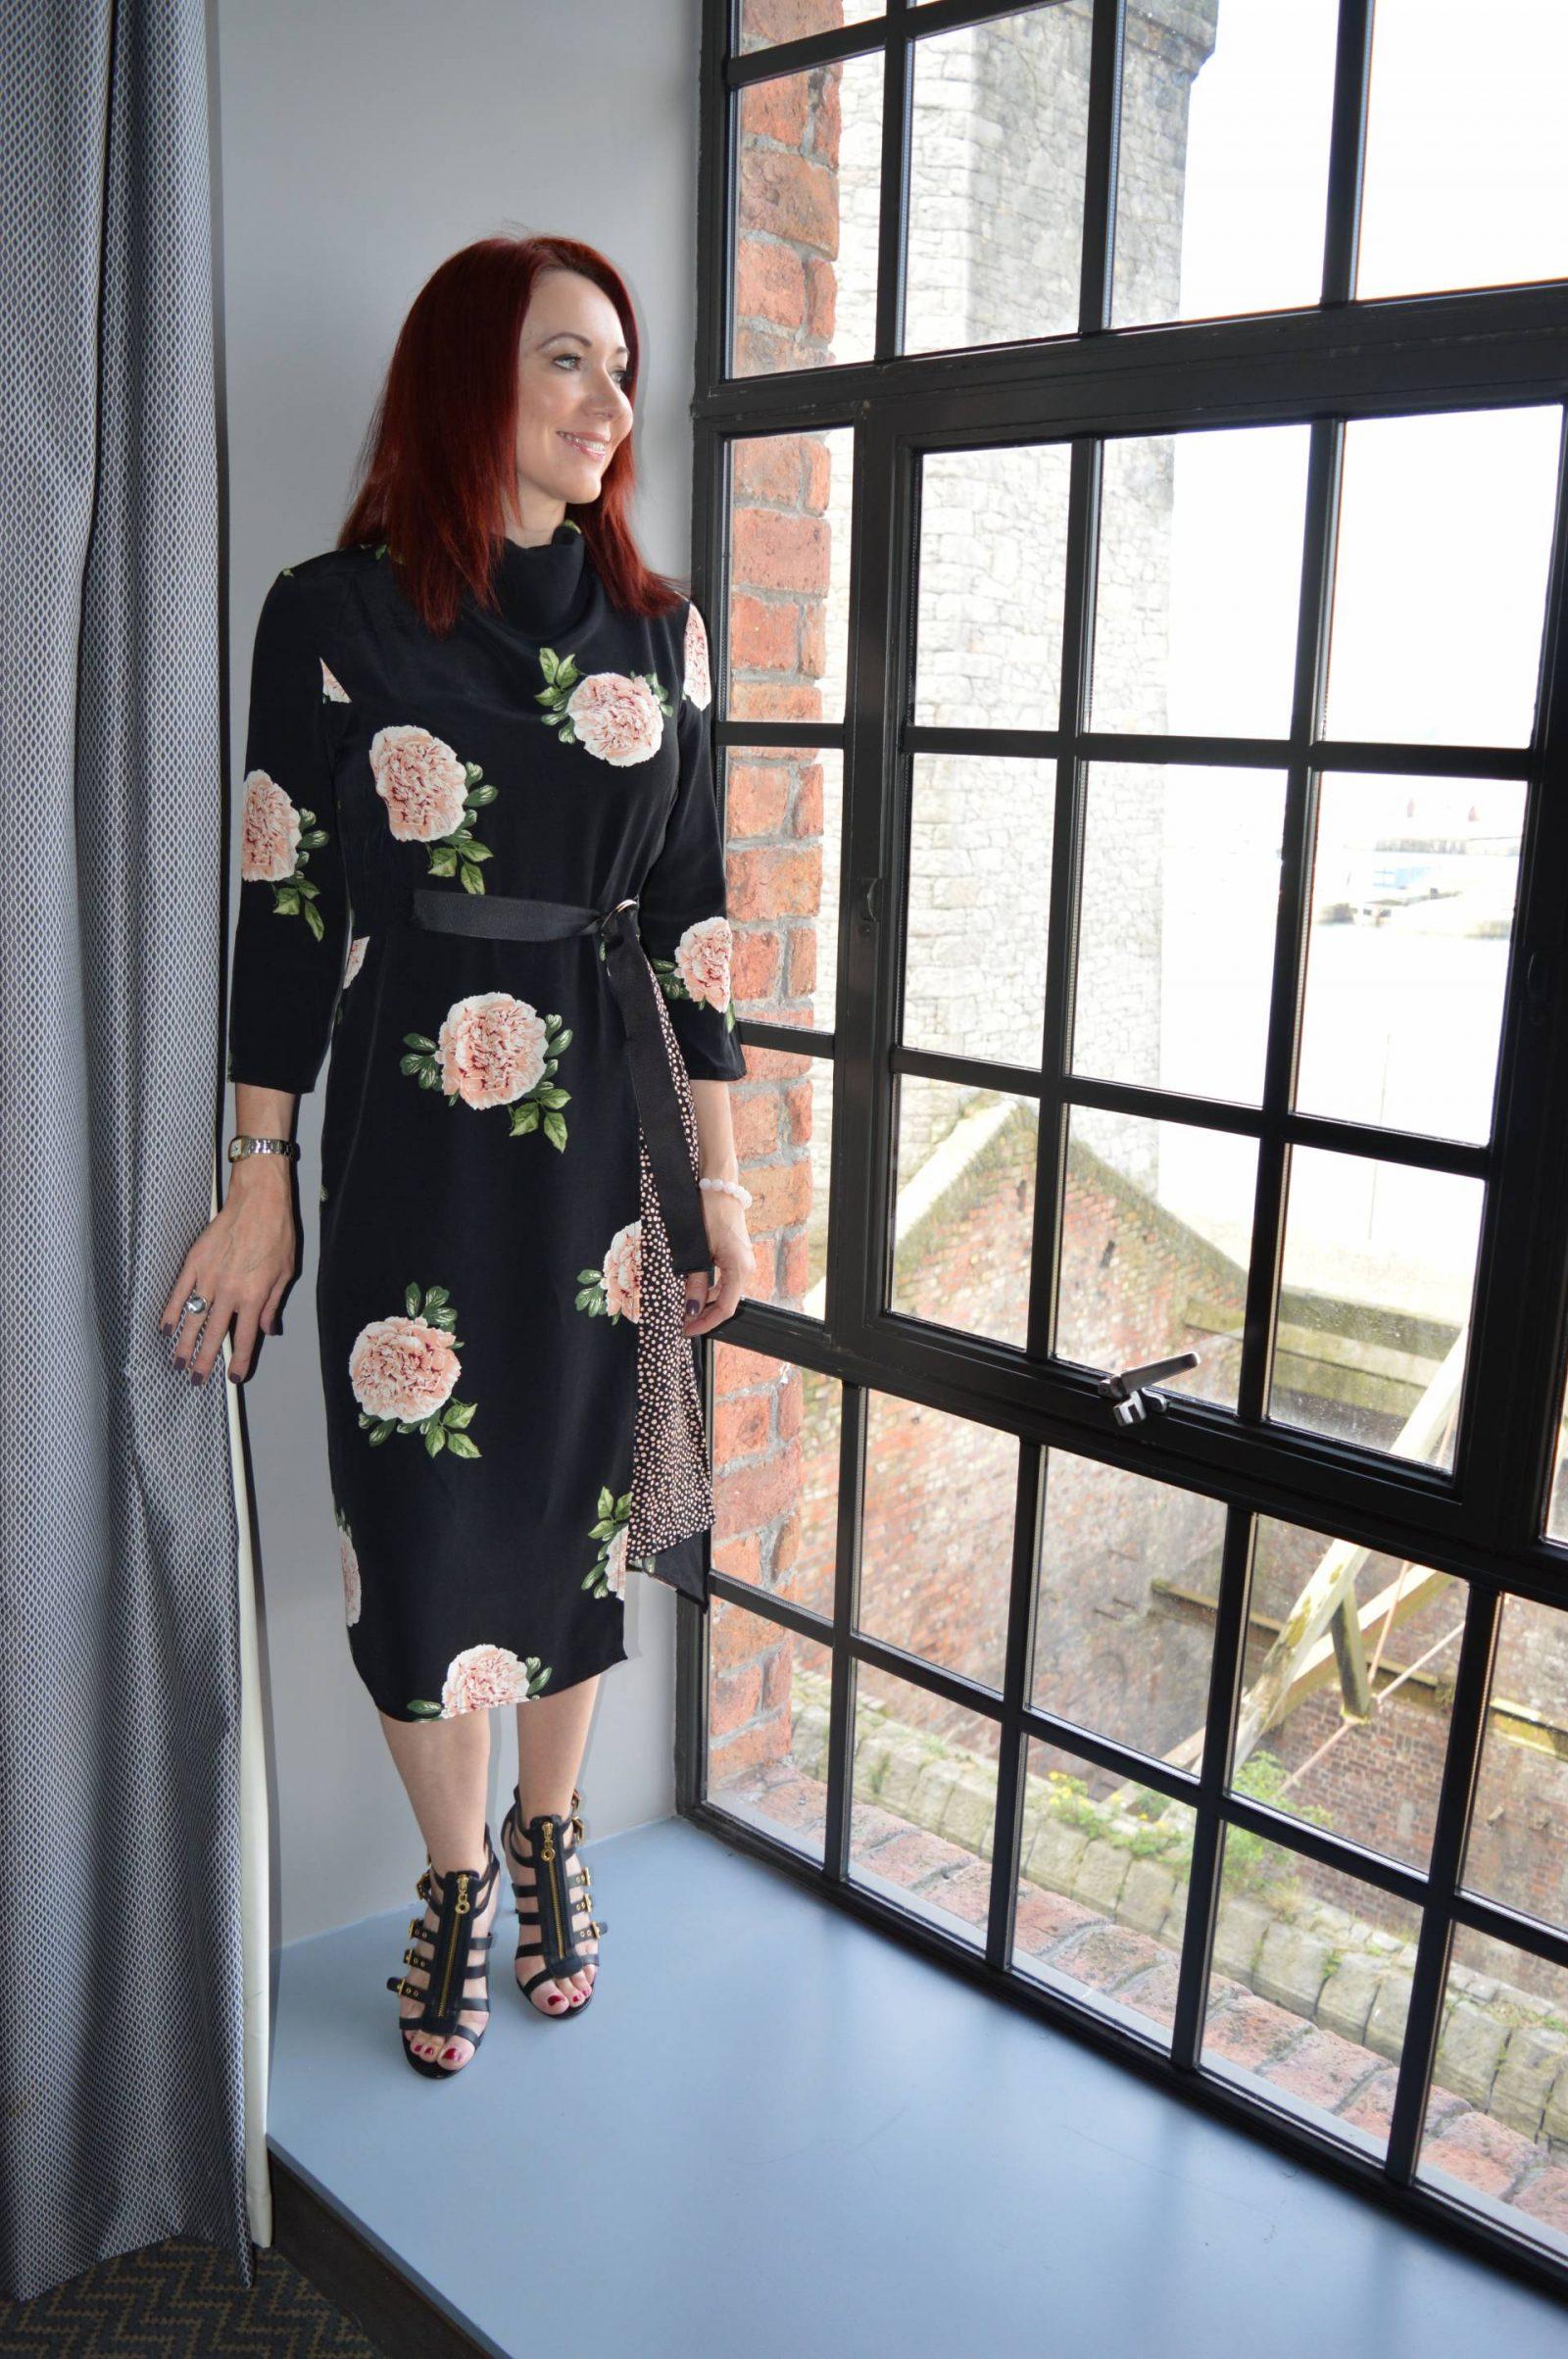 Black Rose Print Dress at the Titanic Hotel Liverpool